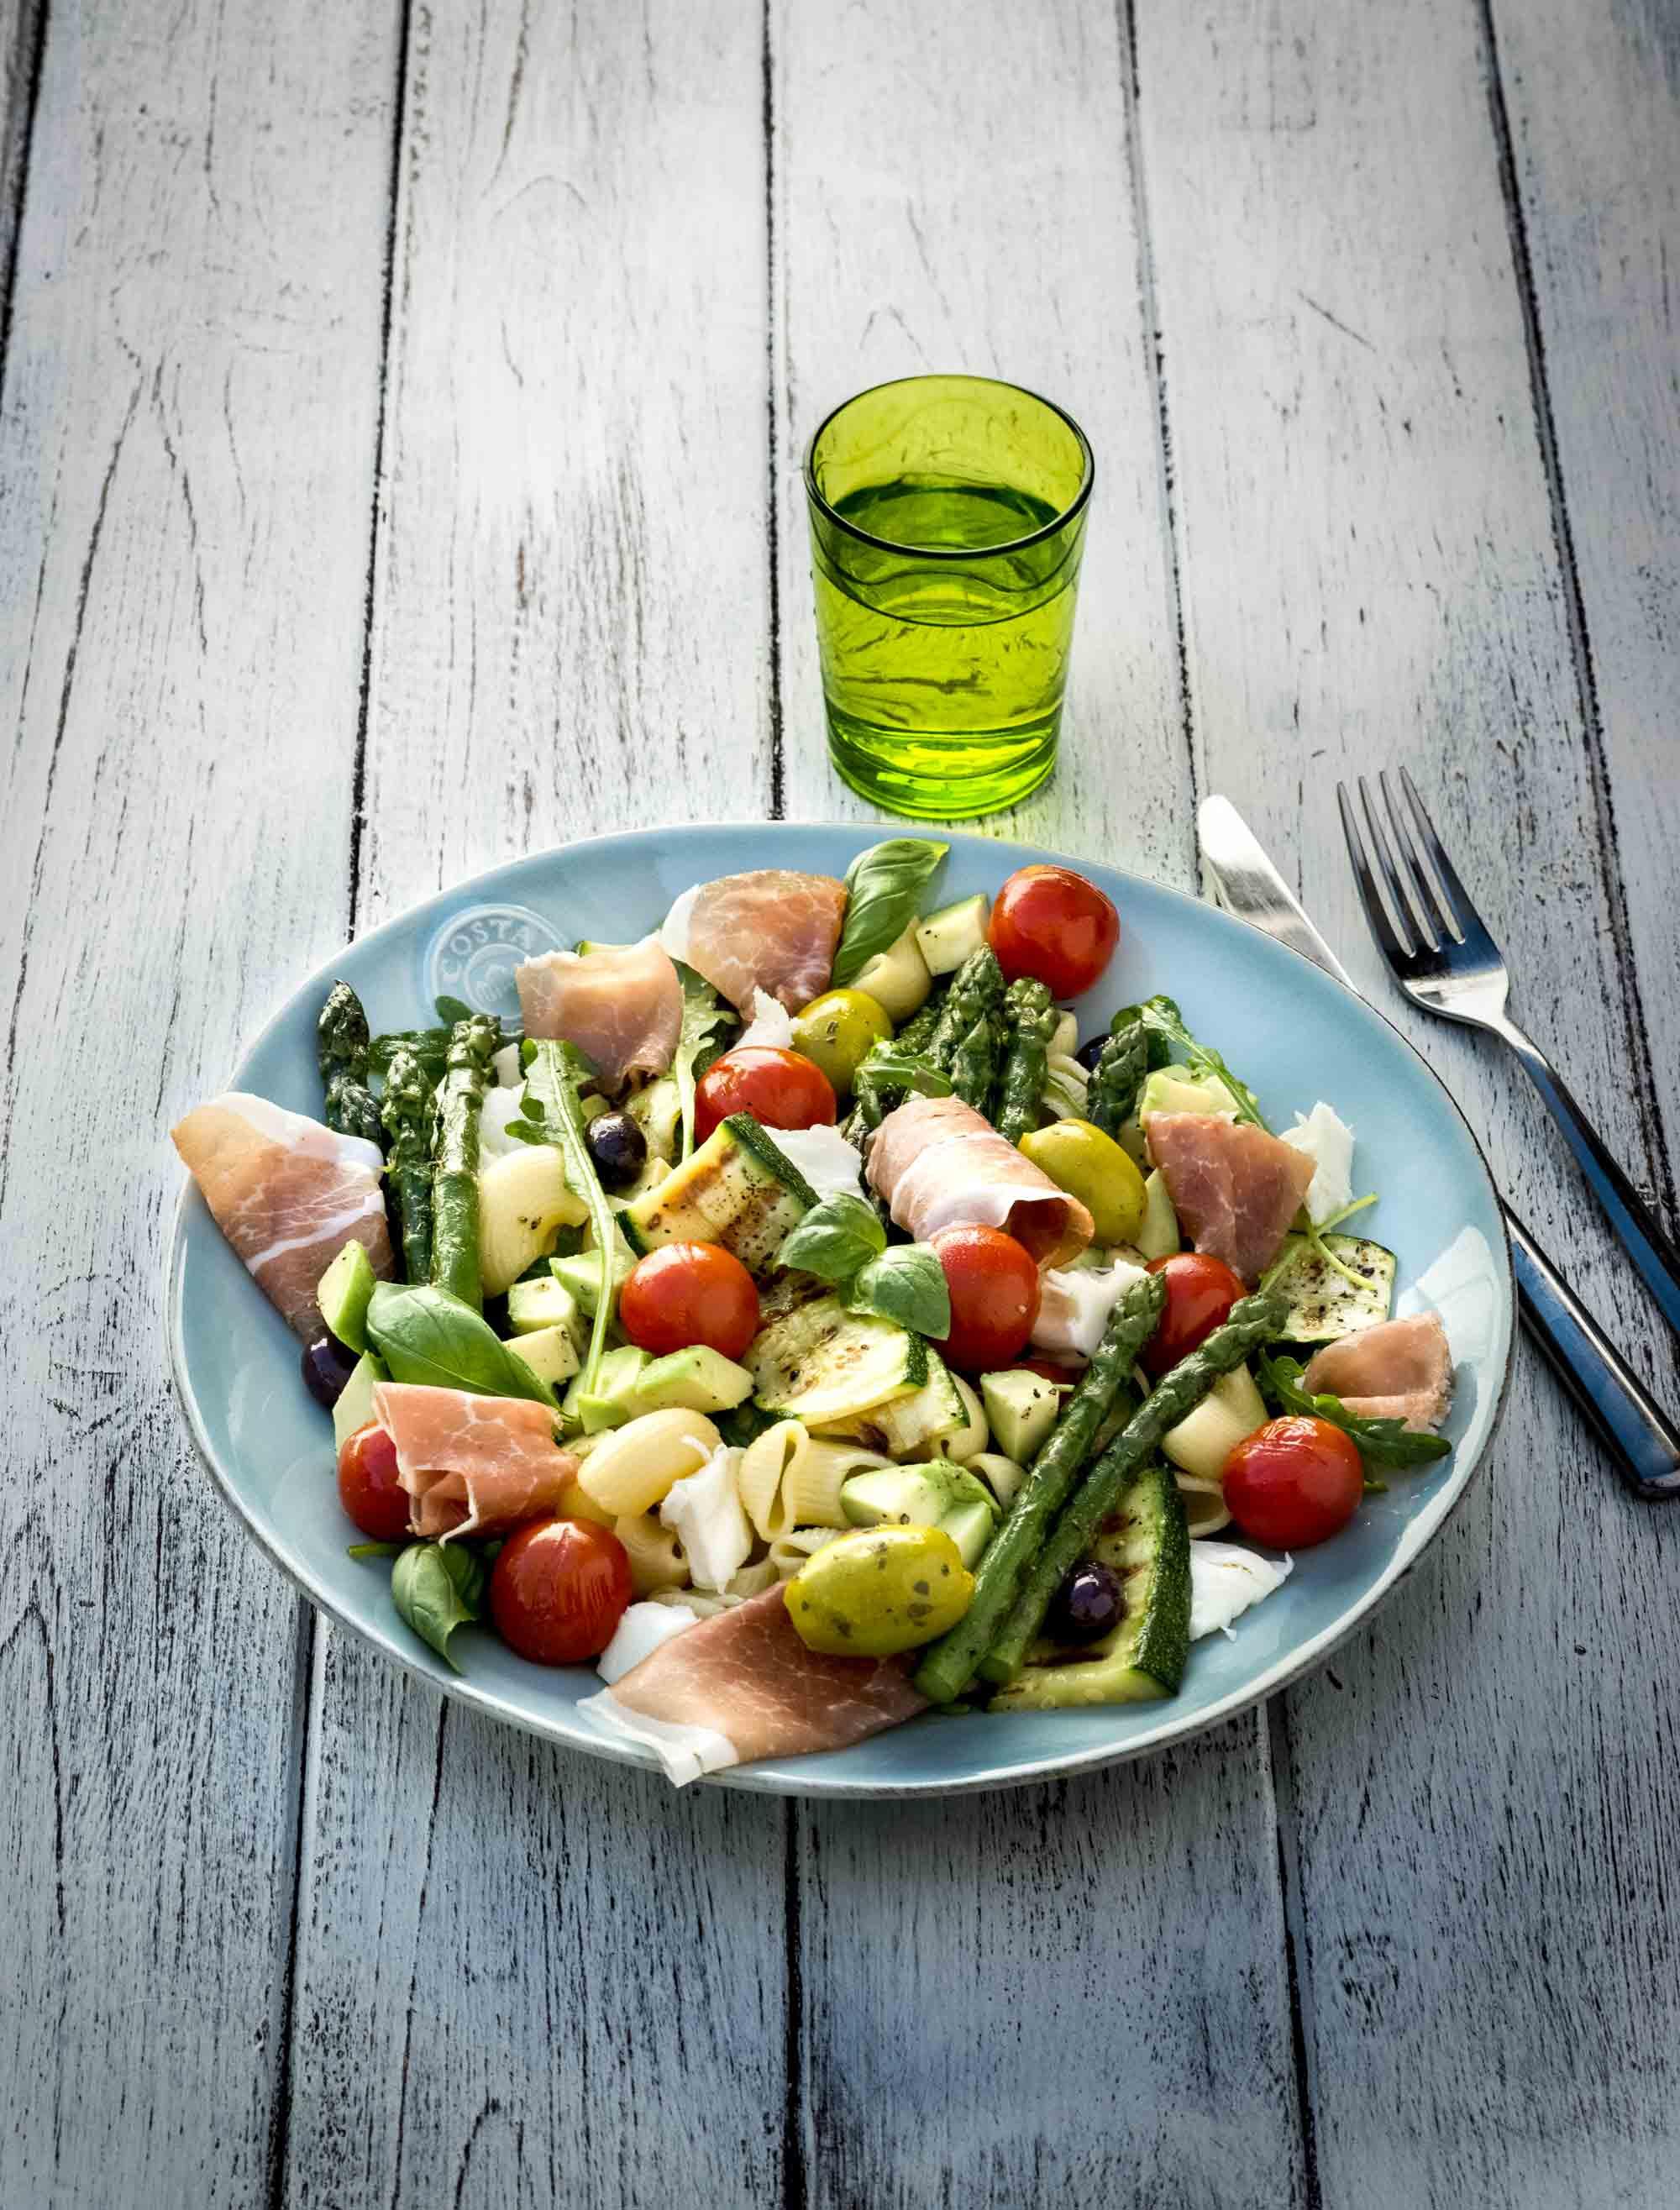 Maison steffen recettes salade p tes asperges jambon - Salade de pates jambon ...